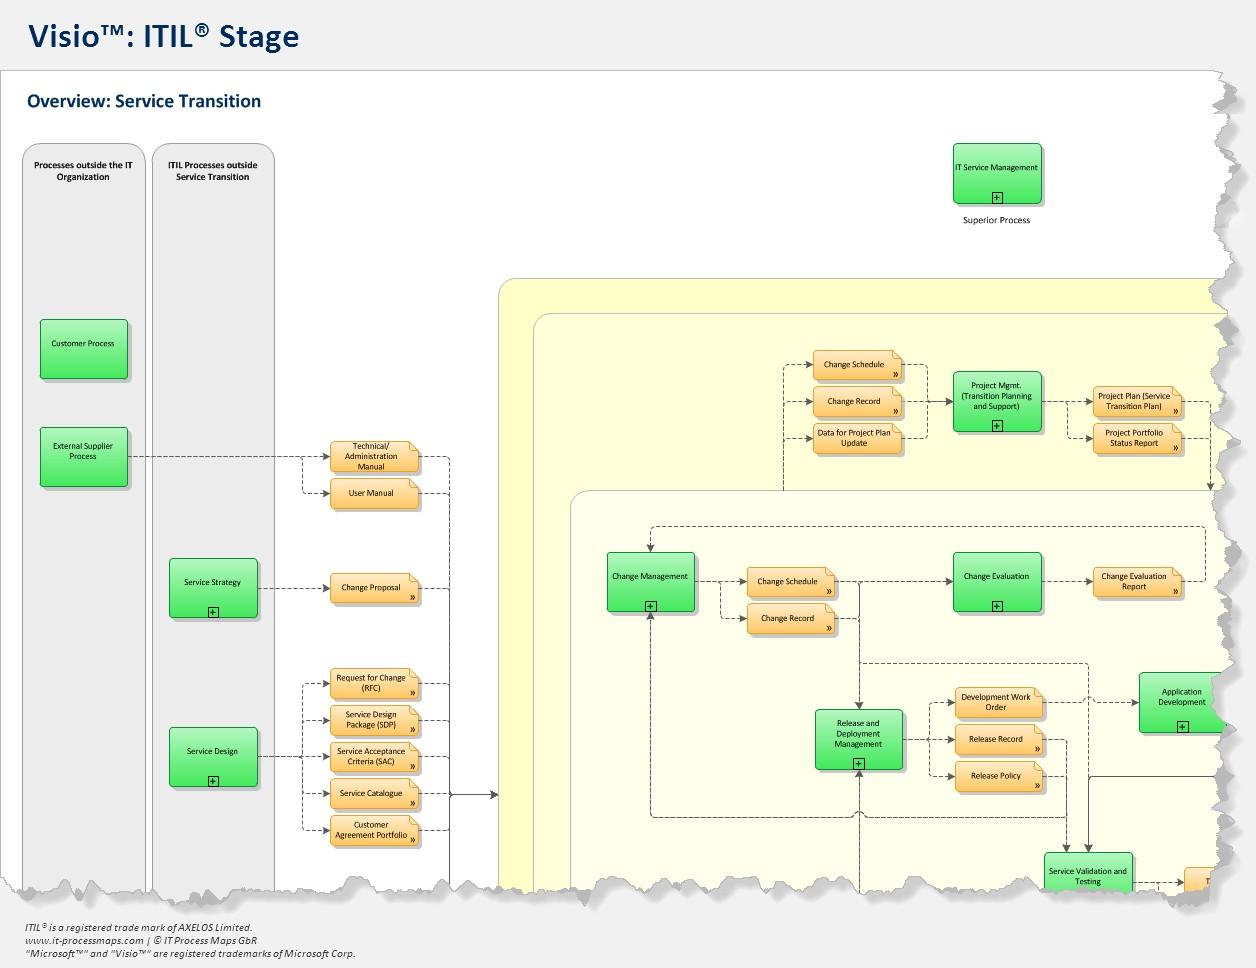 28+ [ Visio 2010 Bpmn ]   using visio 2010 bpmn to design ... Visio Wiring Diagram Template on wiring diagram book, wiring diagram templates, wiring diagram cloud,